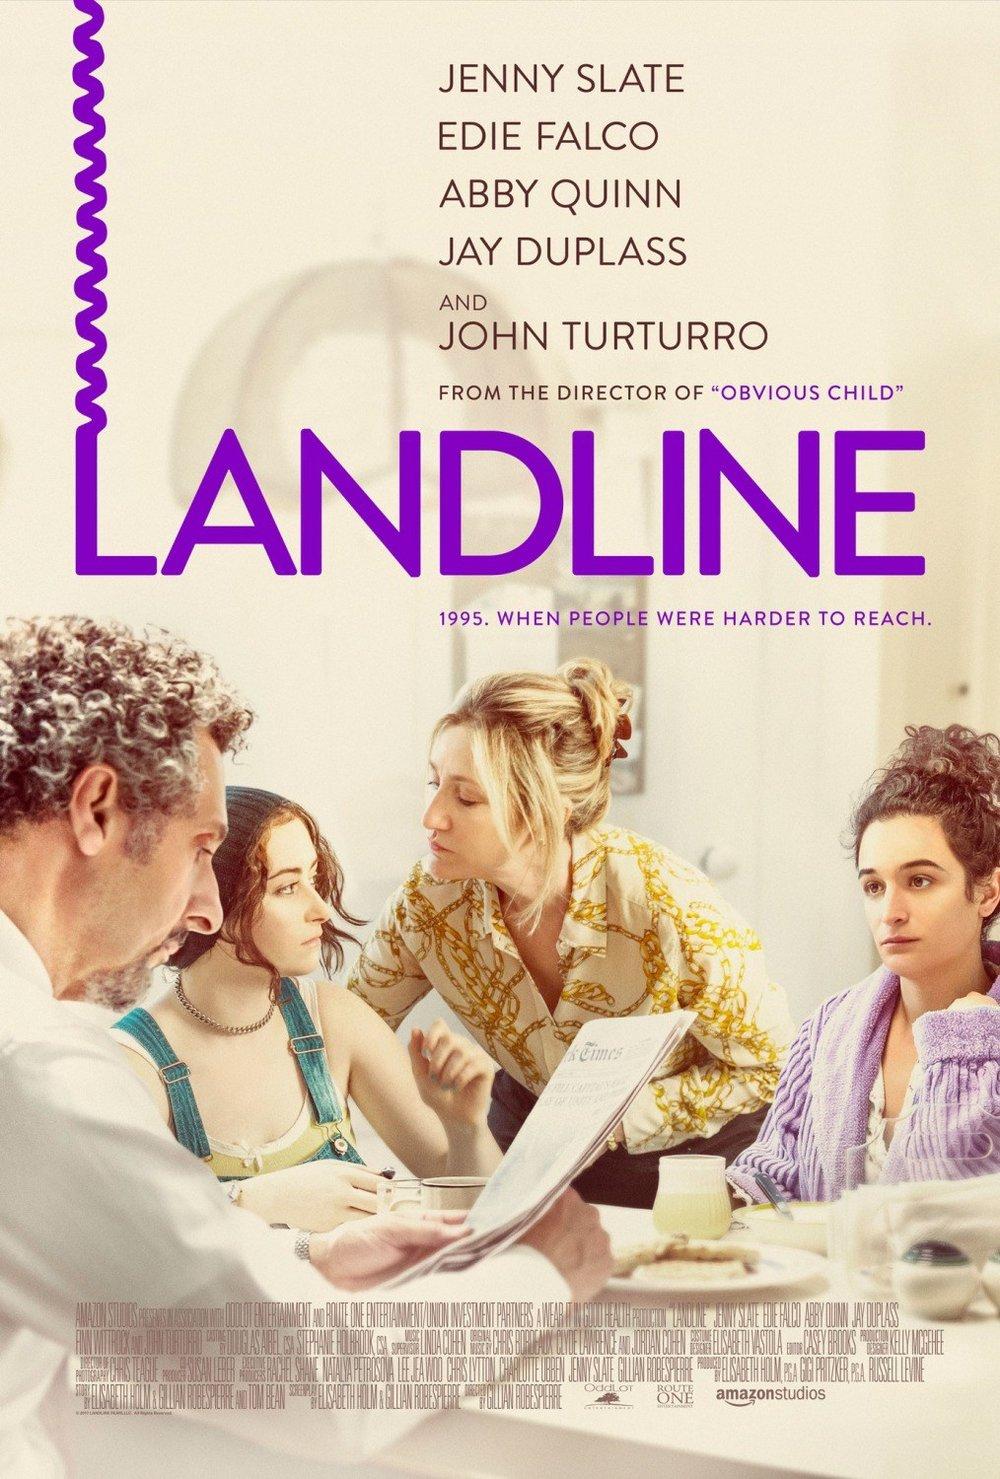 Landline-movie-poster.jpg